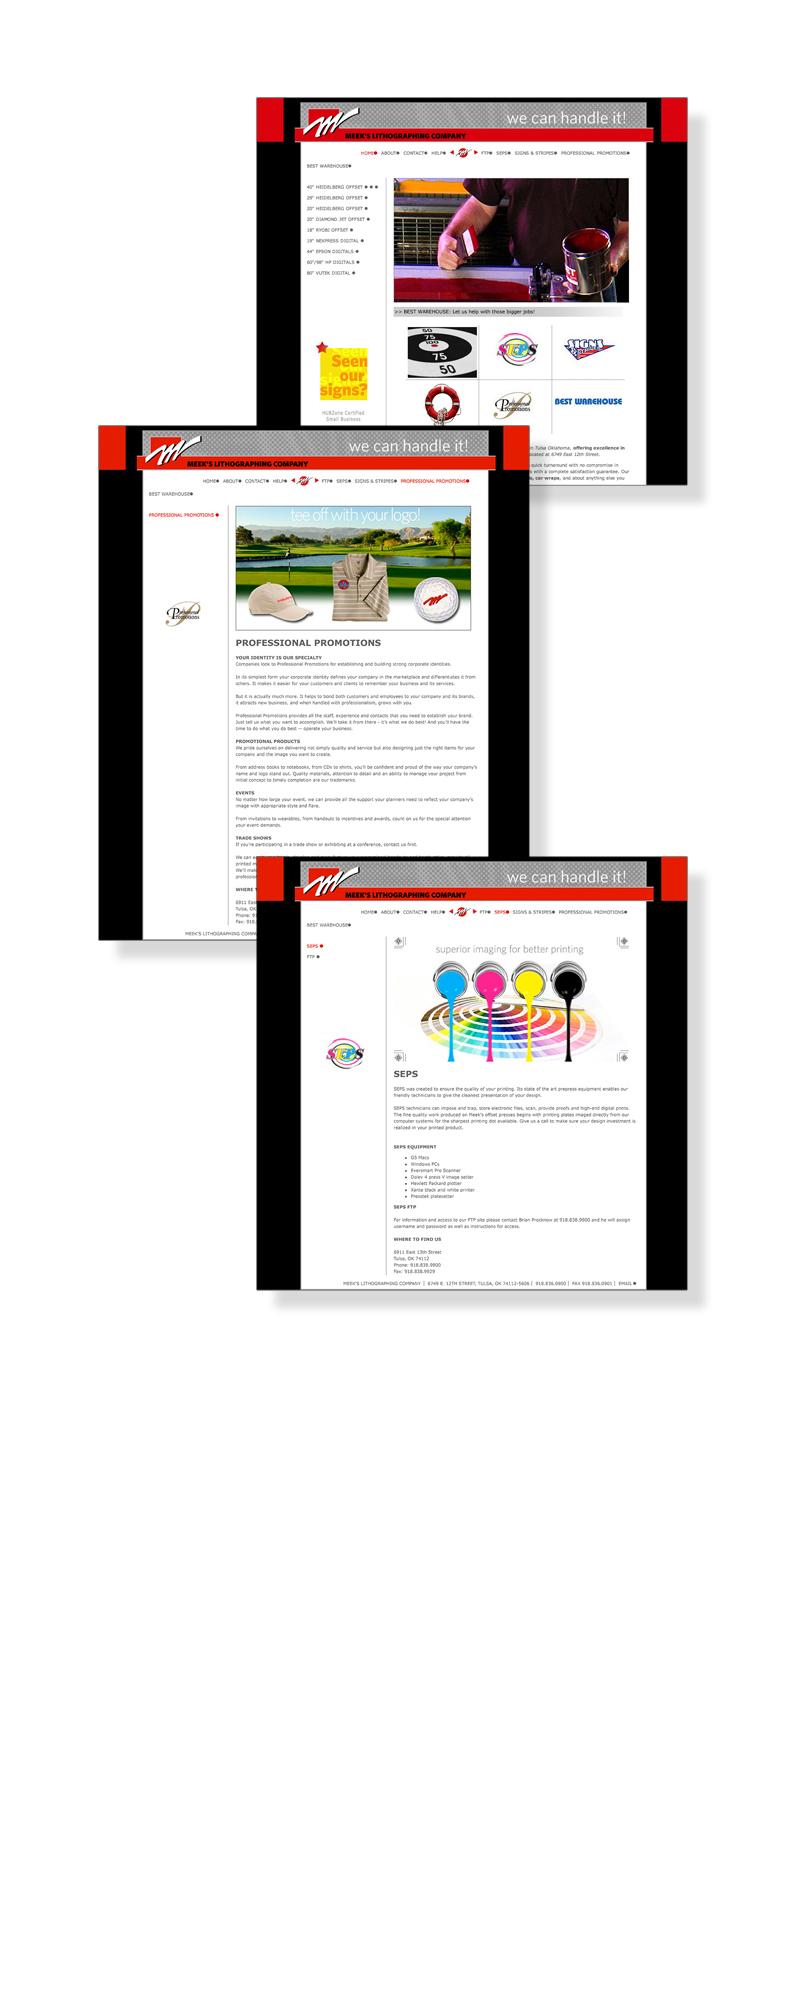 meeks-pages-tmoss-portfolio.jpg